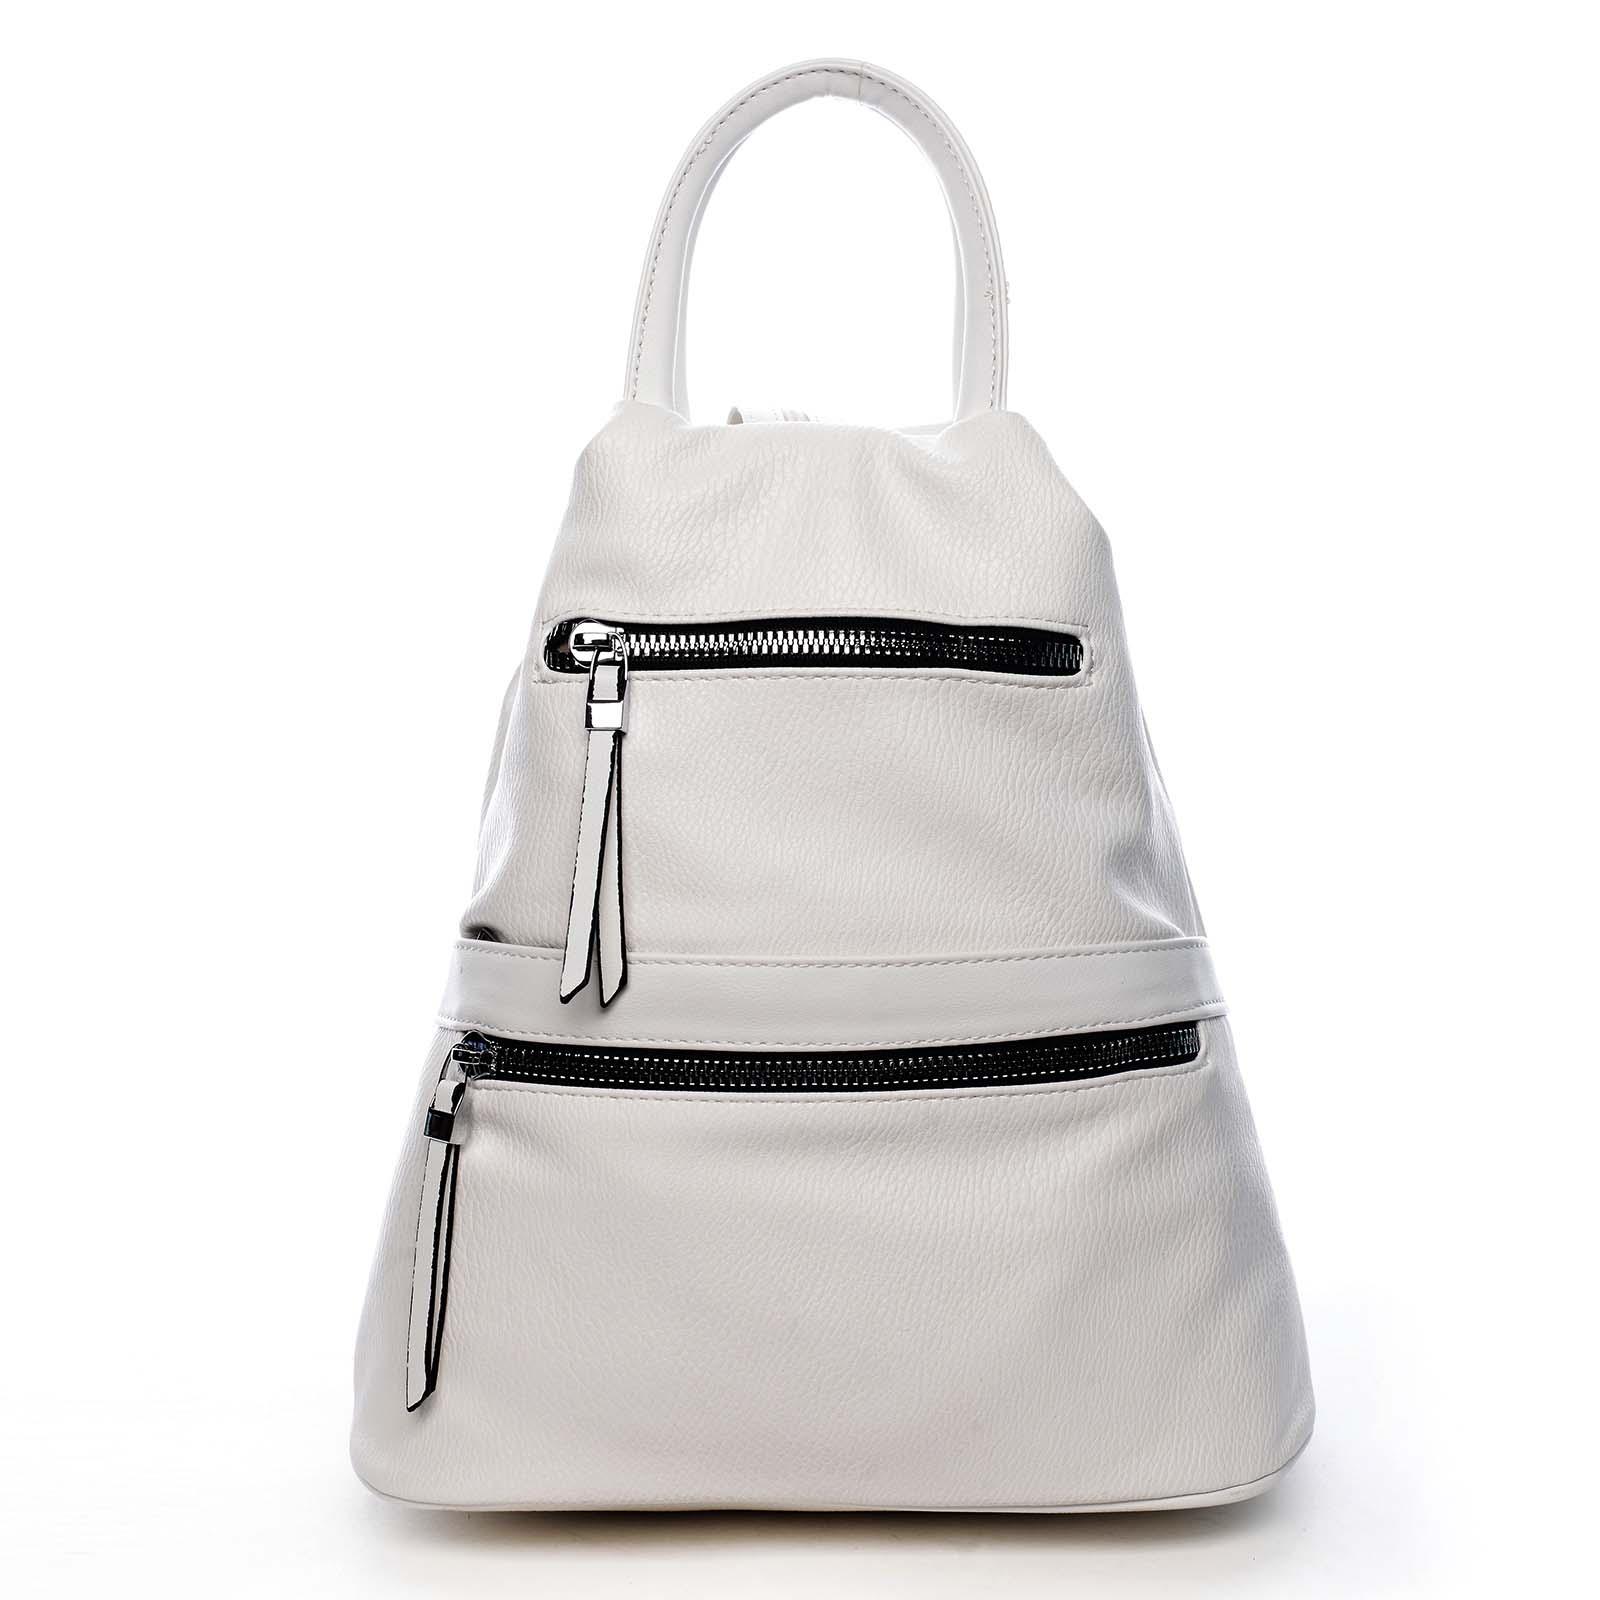 Originální dámský batoh kabelka bílý - Romina Gempela bílá